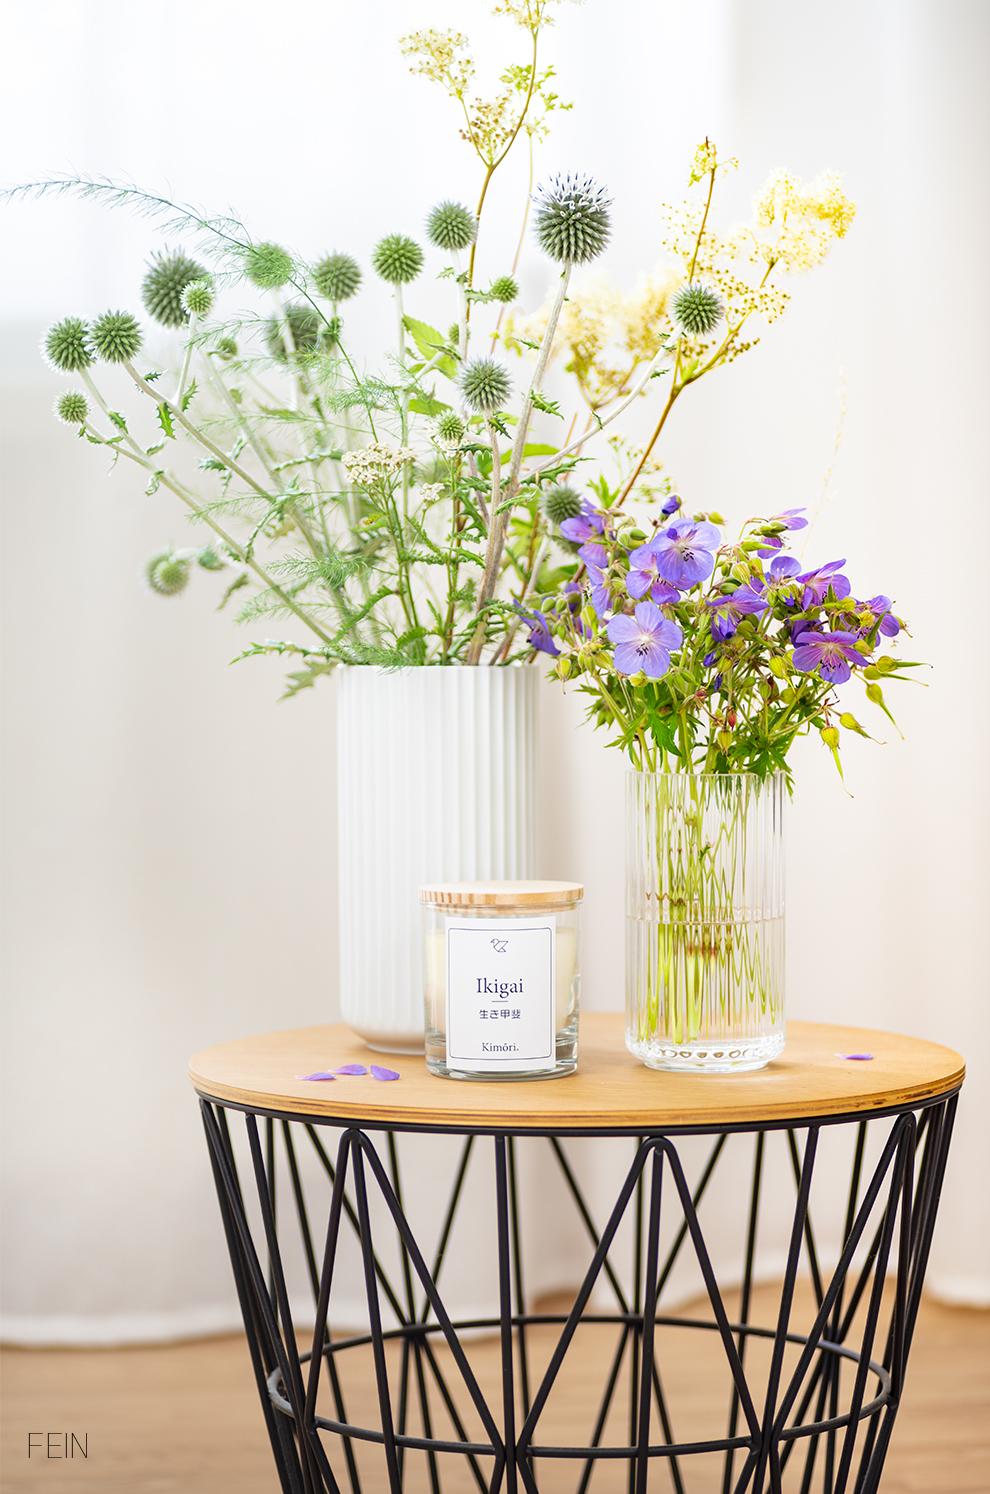 Wiesenblumen Sommer Deko